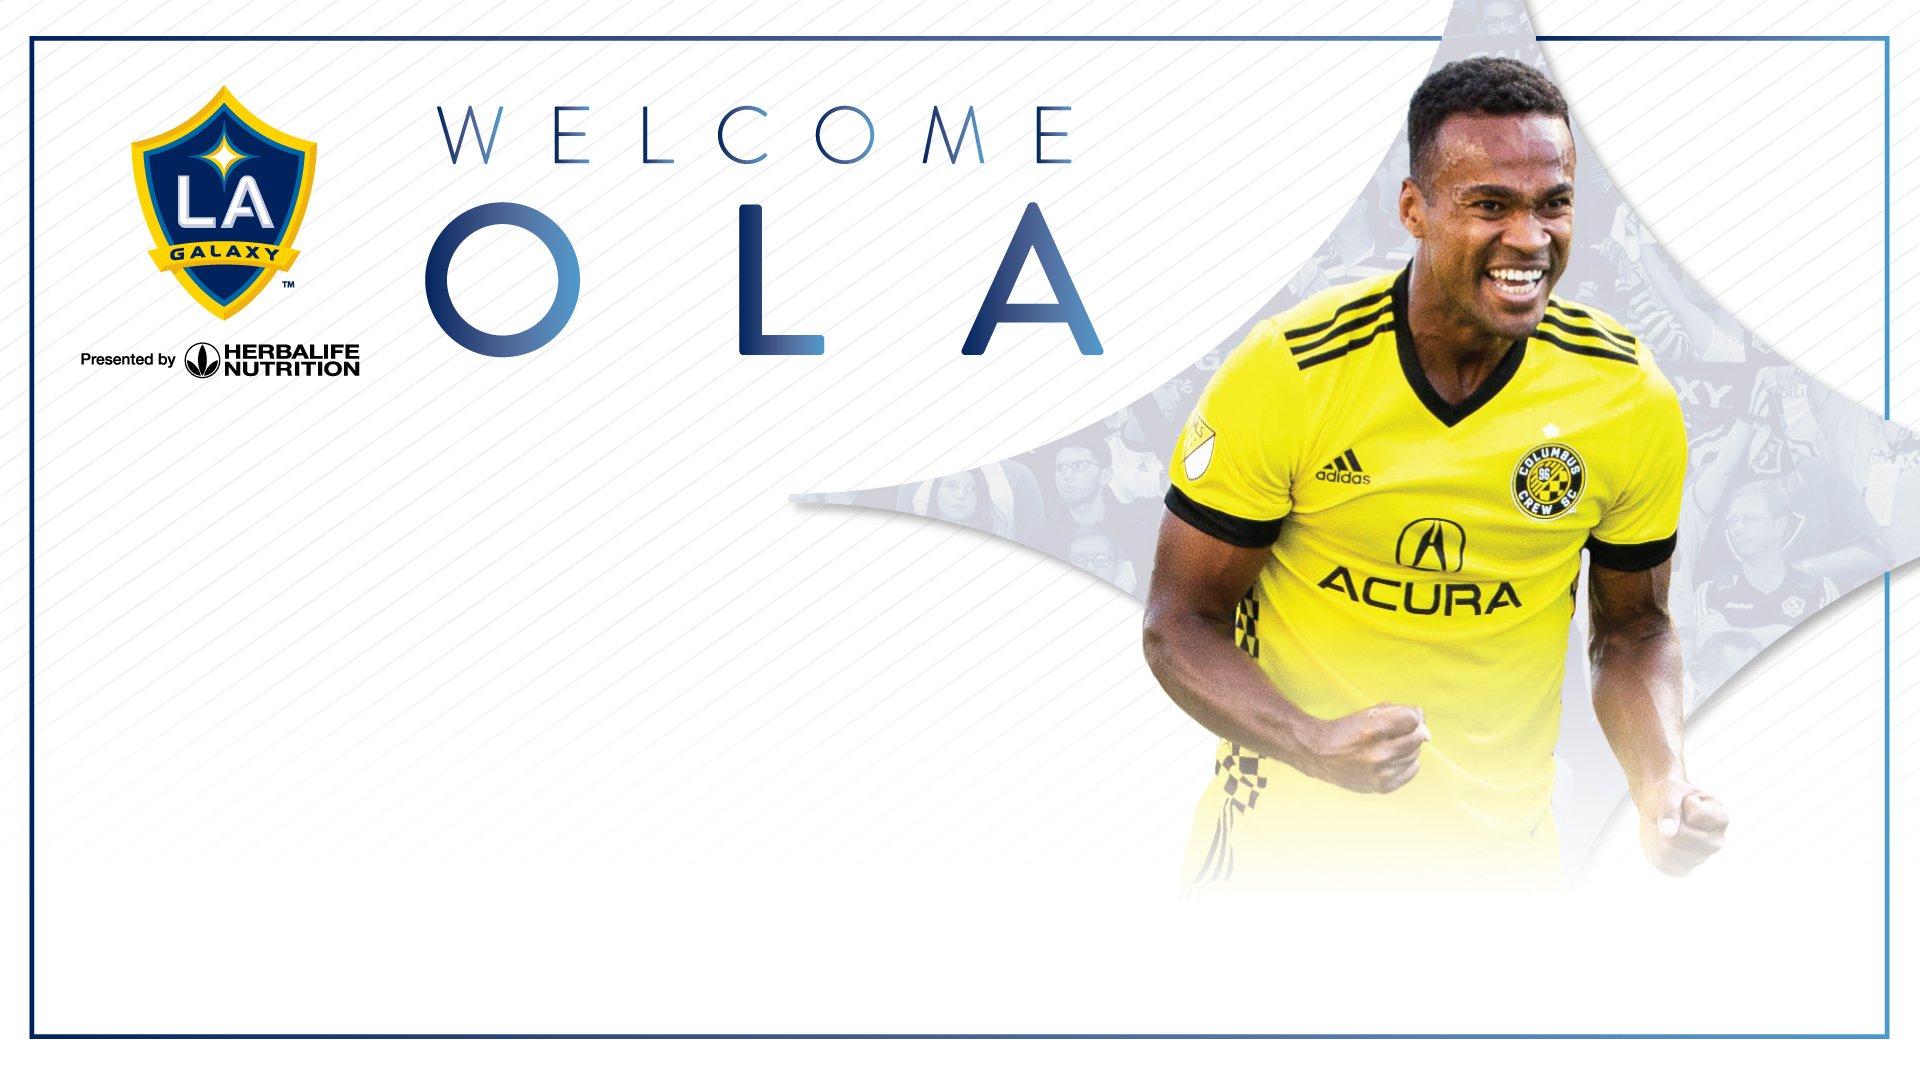 [TRADE] #LAGalaxy acquire forward @OlaKamara from @ColumbusCrewSC: https://t.co/jNXNFpkkWS https://t.co/5QKEJnCqtI